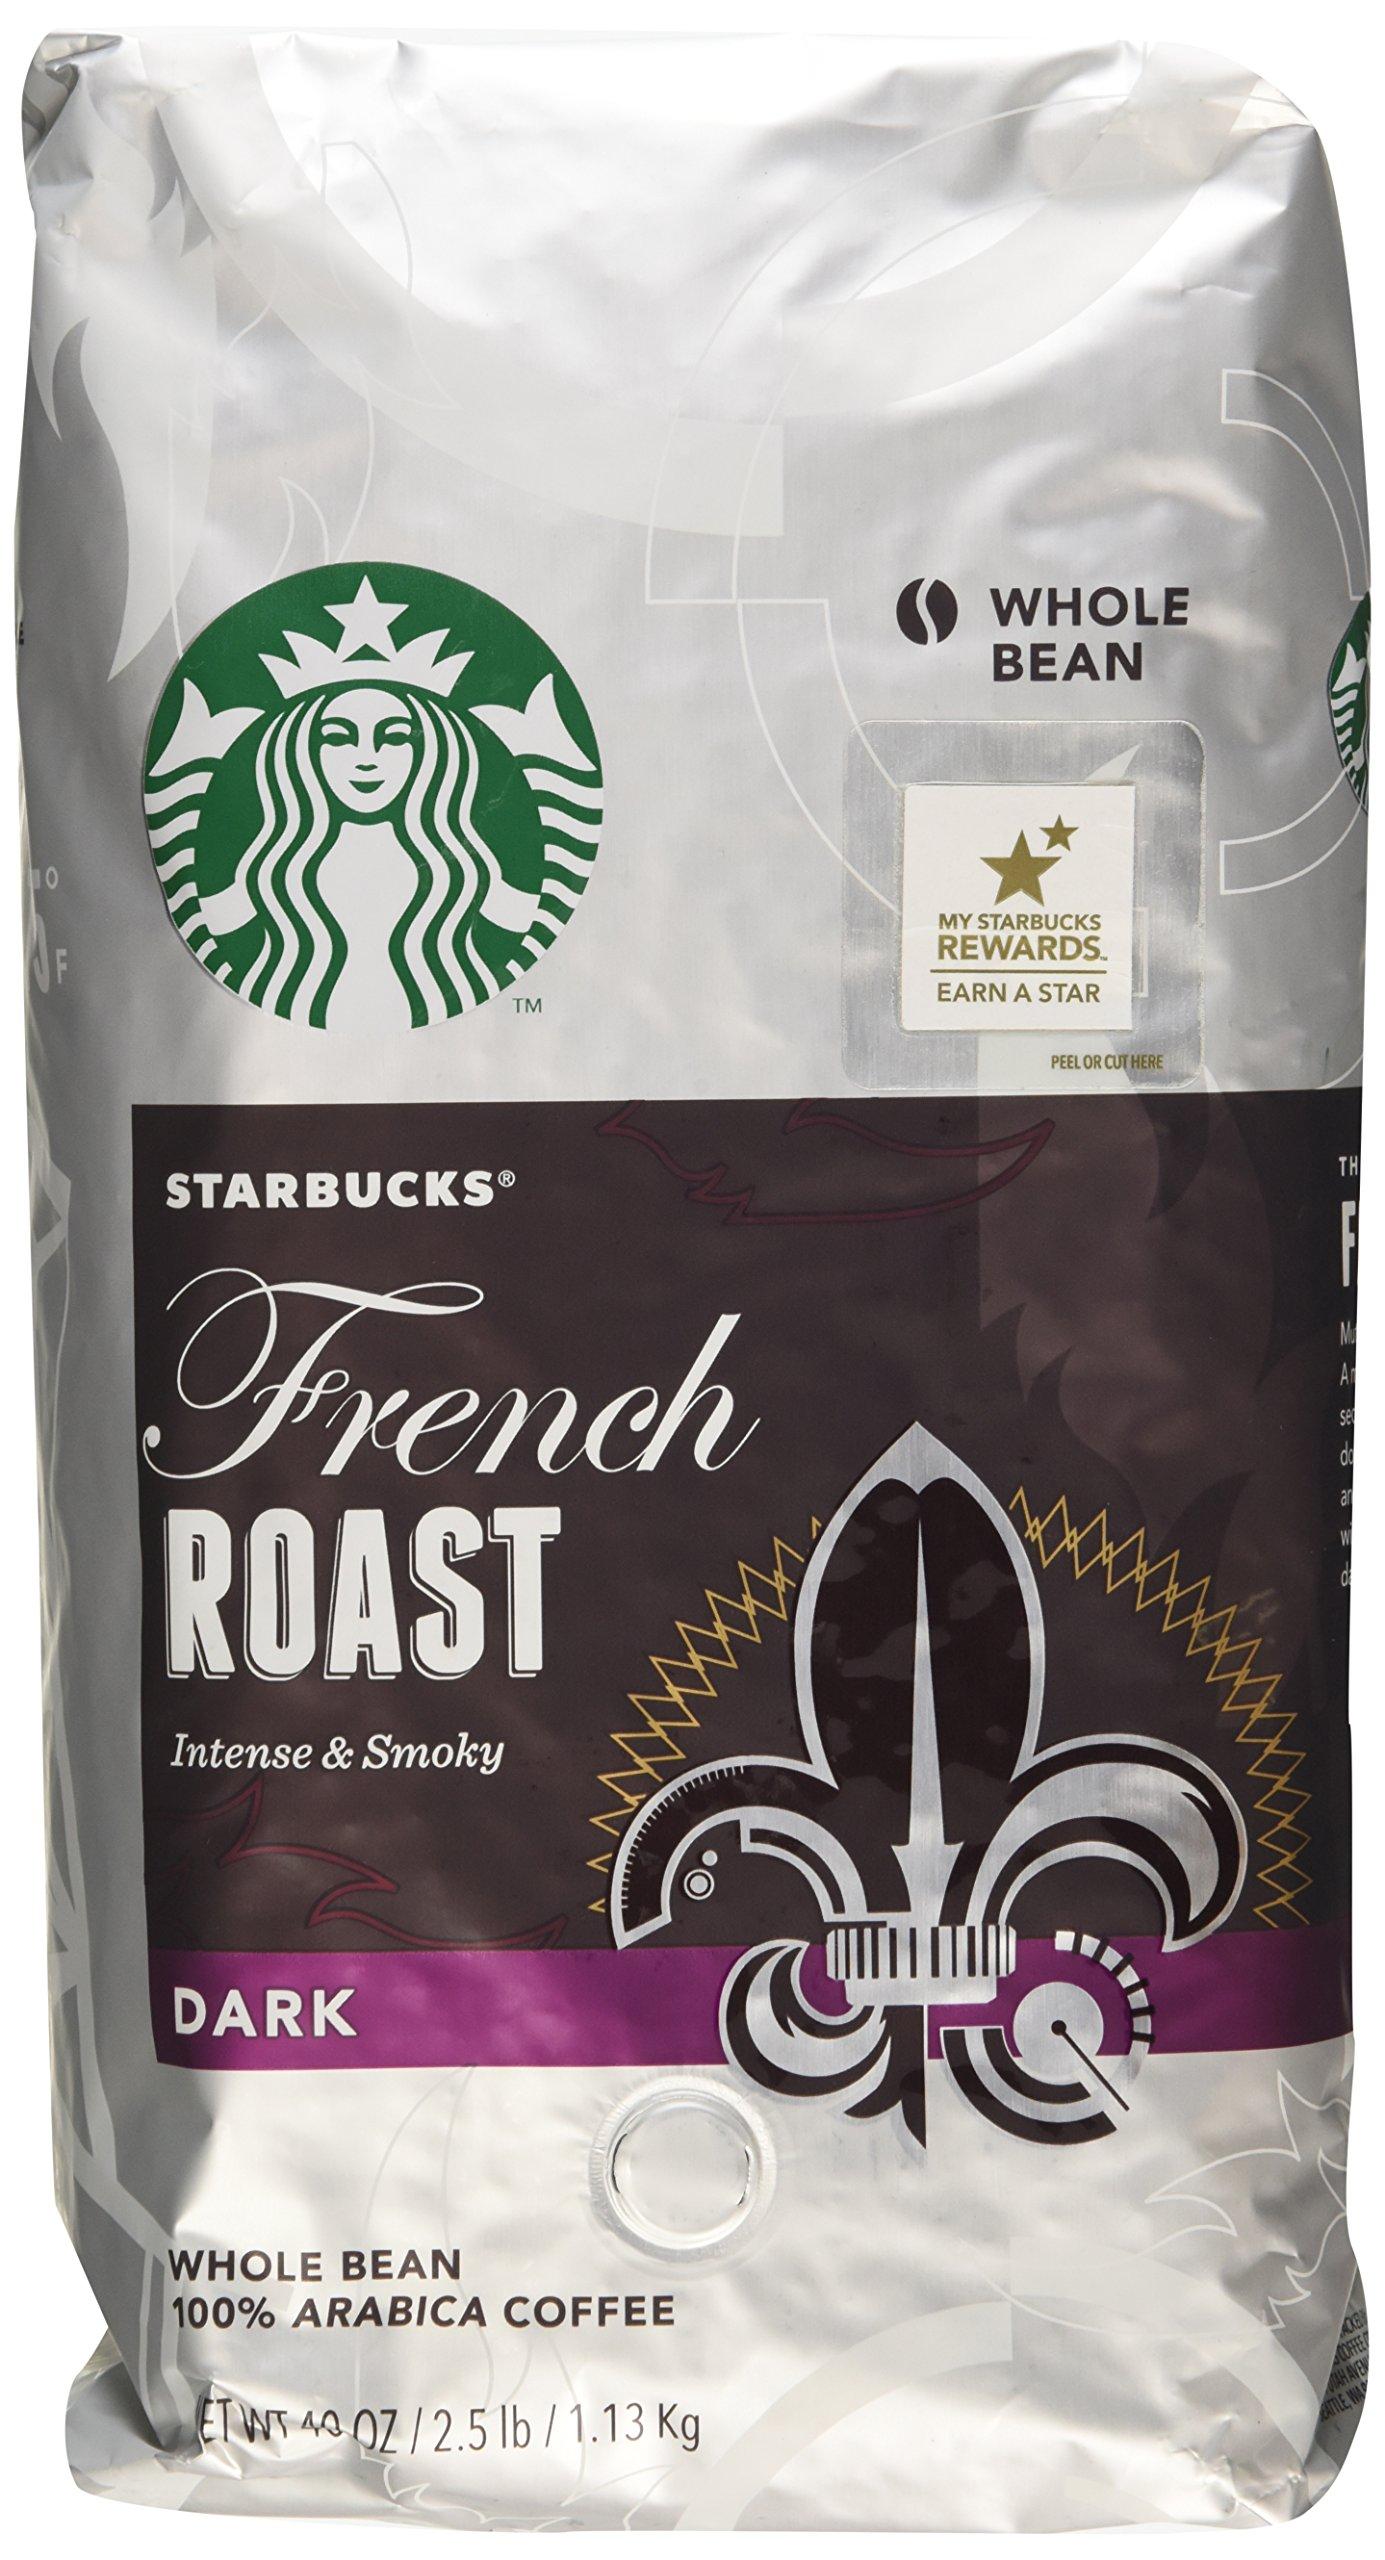 Starbucks French Roast Dark Whole Bean Coffee - 2 - 40 Oz Pack by Starbucks